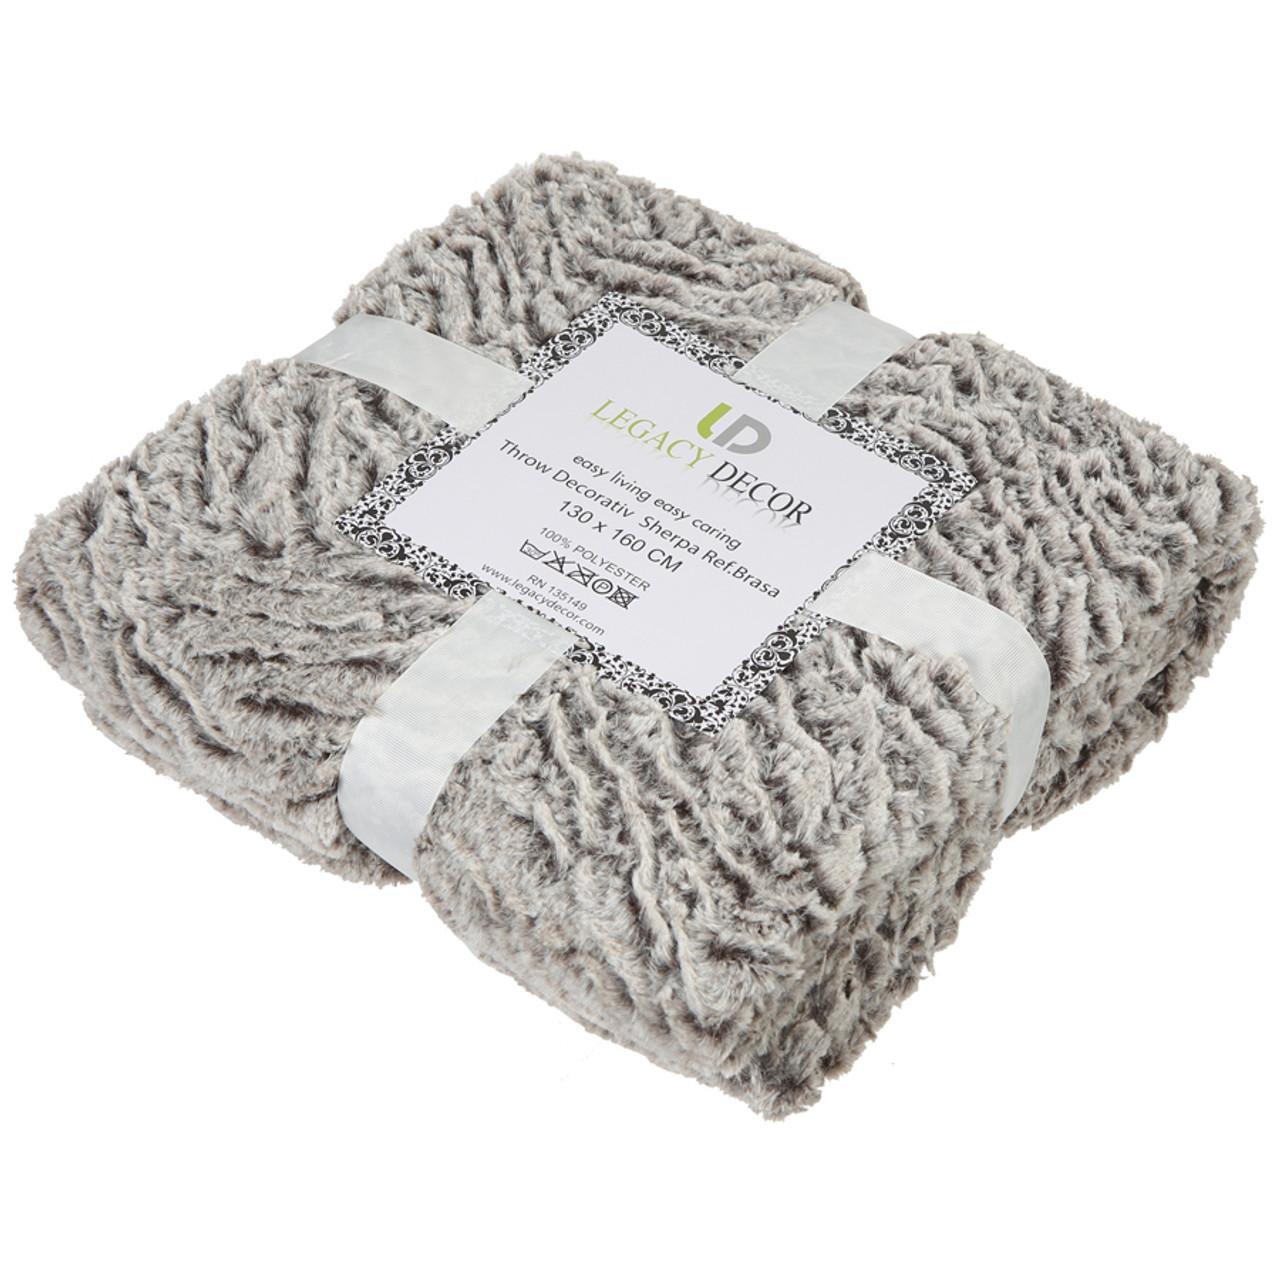 "Luxury Faux Micro Fur Wave Design Ultra Plush and Super Soft Sherpa Fleece Decorative Throw Blanket, Grey 51"" x 60"""